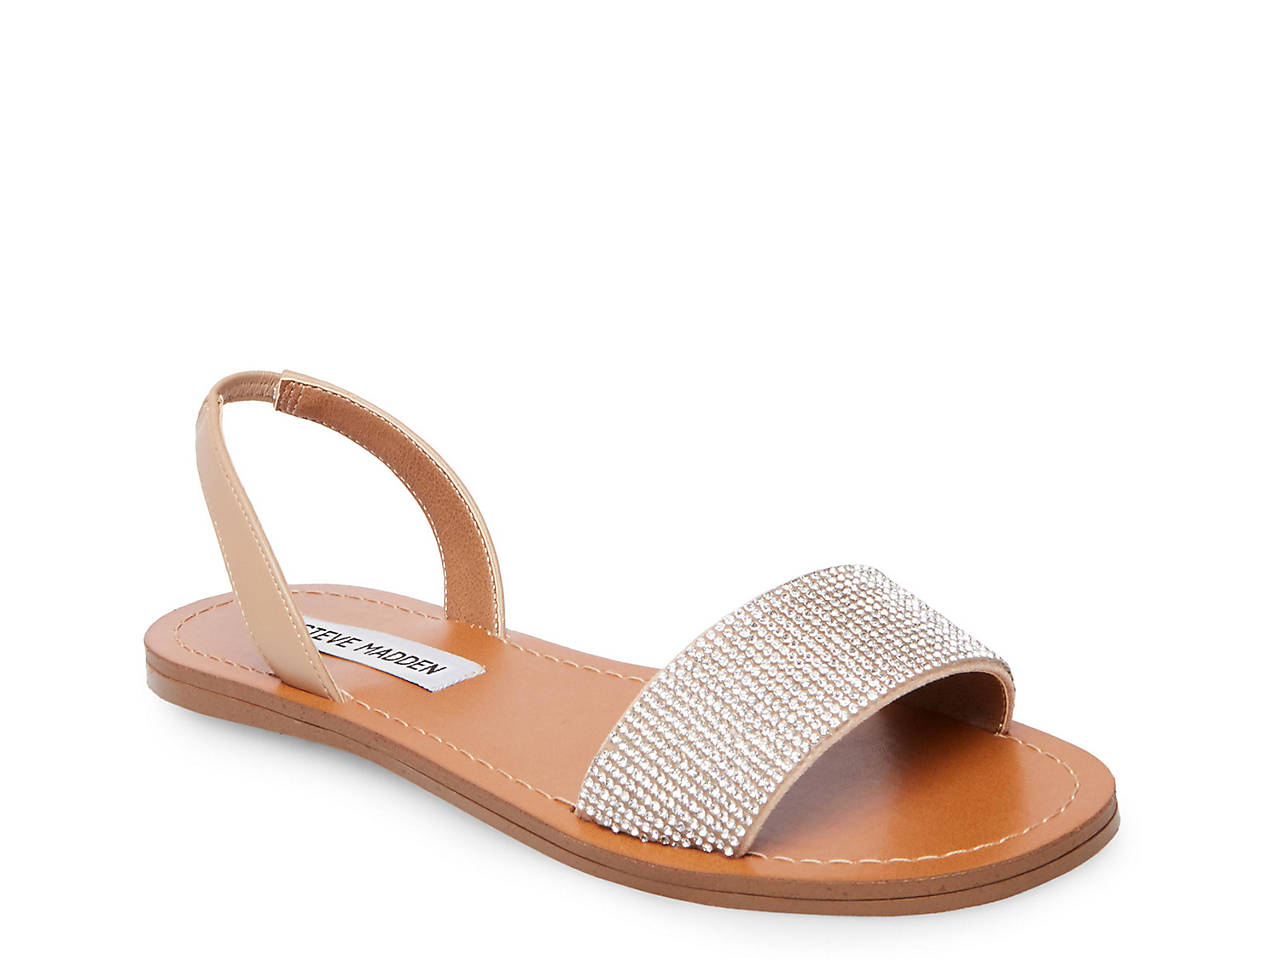 d65628a9b52 Rock Flat Sandal